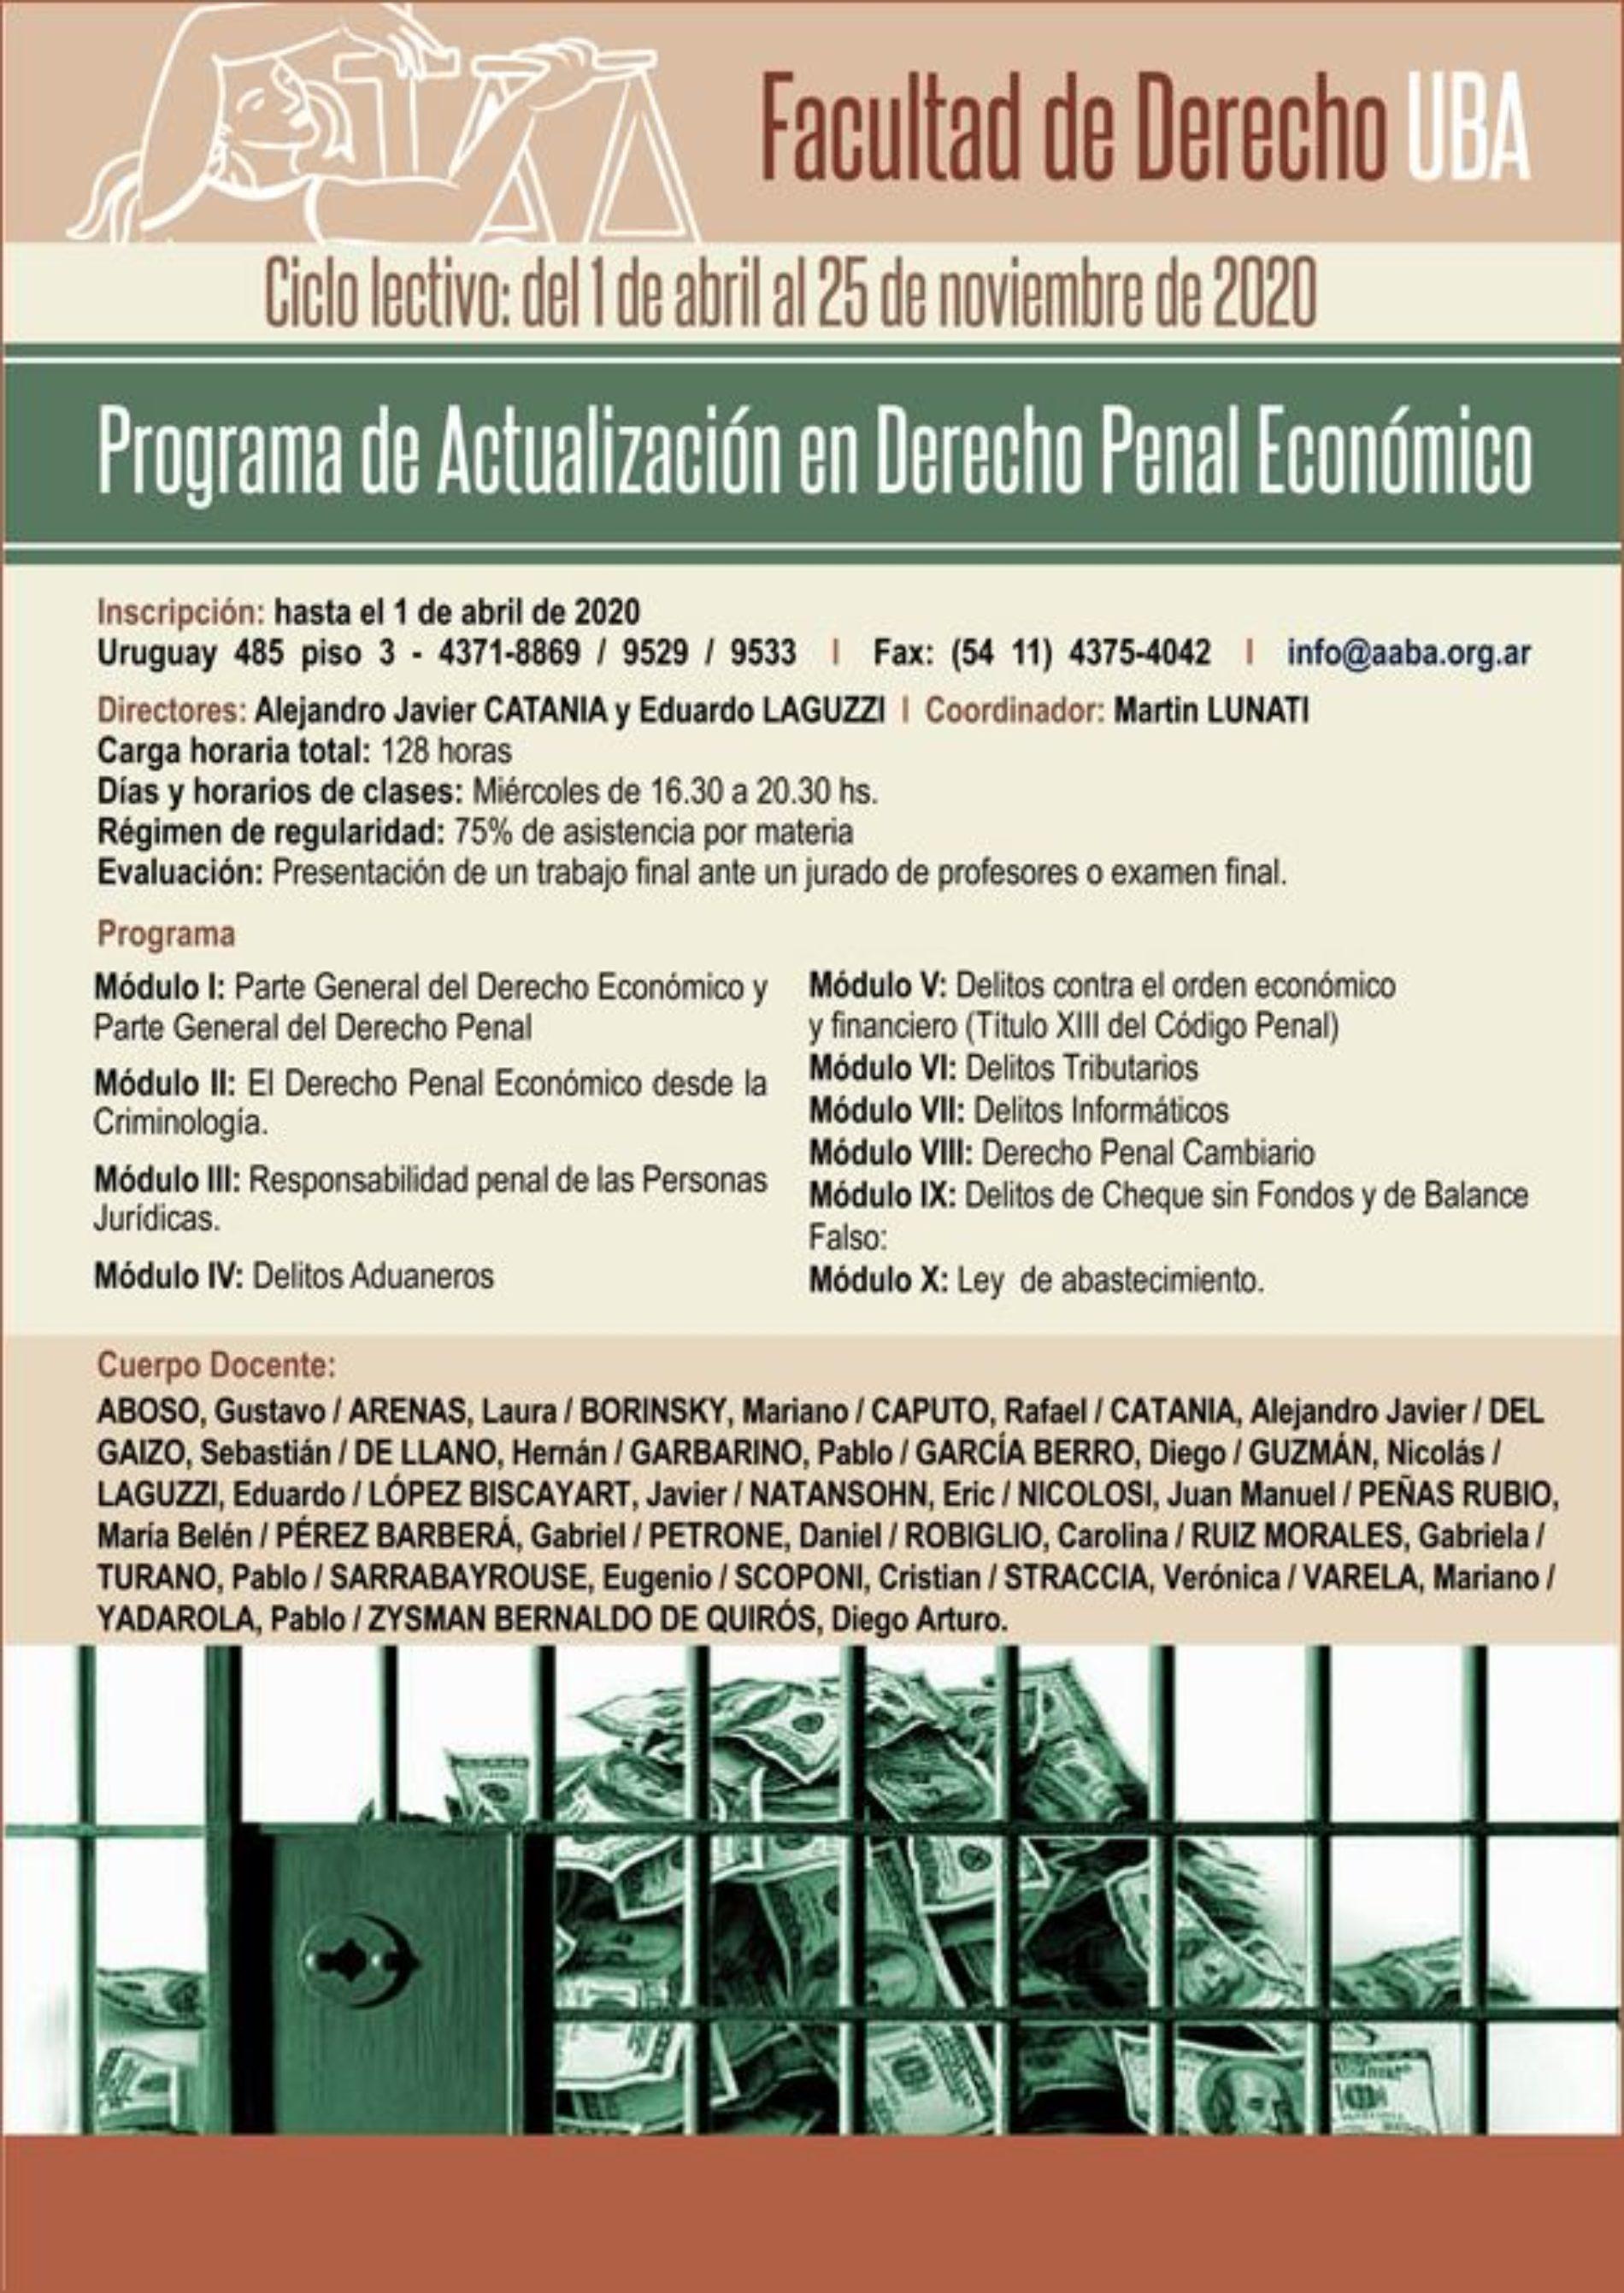 «Programa de Actualización en Derecho Penal Económico»